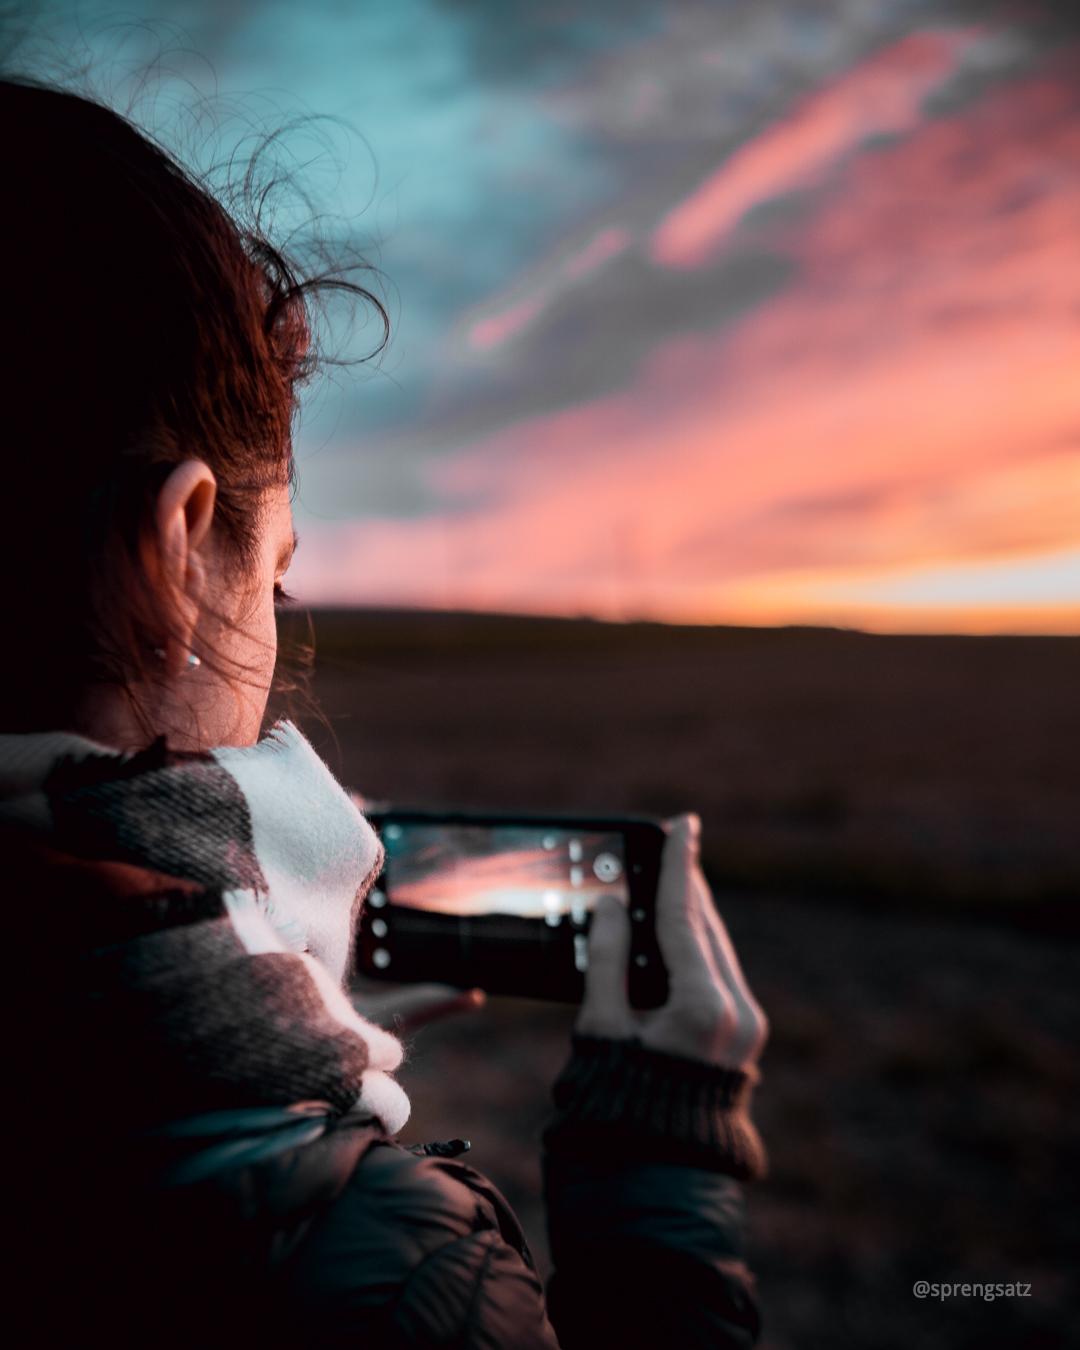 Frau mit Smartphone fotografiert den Sonnenuntergang im Zellertal (Donnersbergkreis)